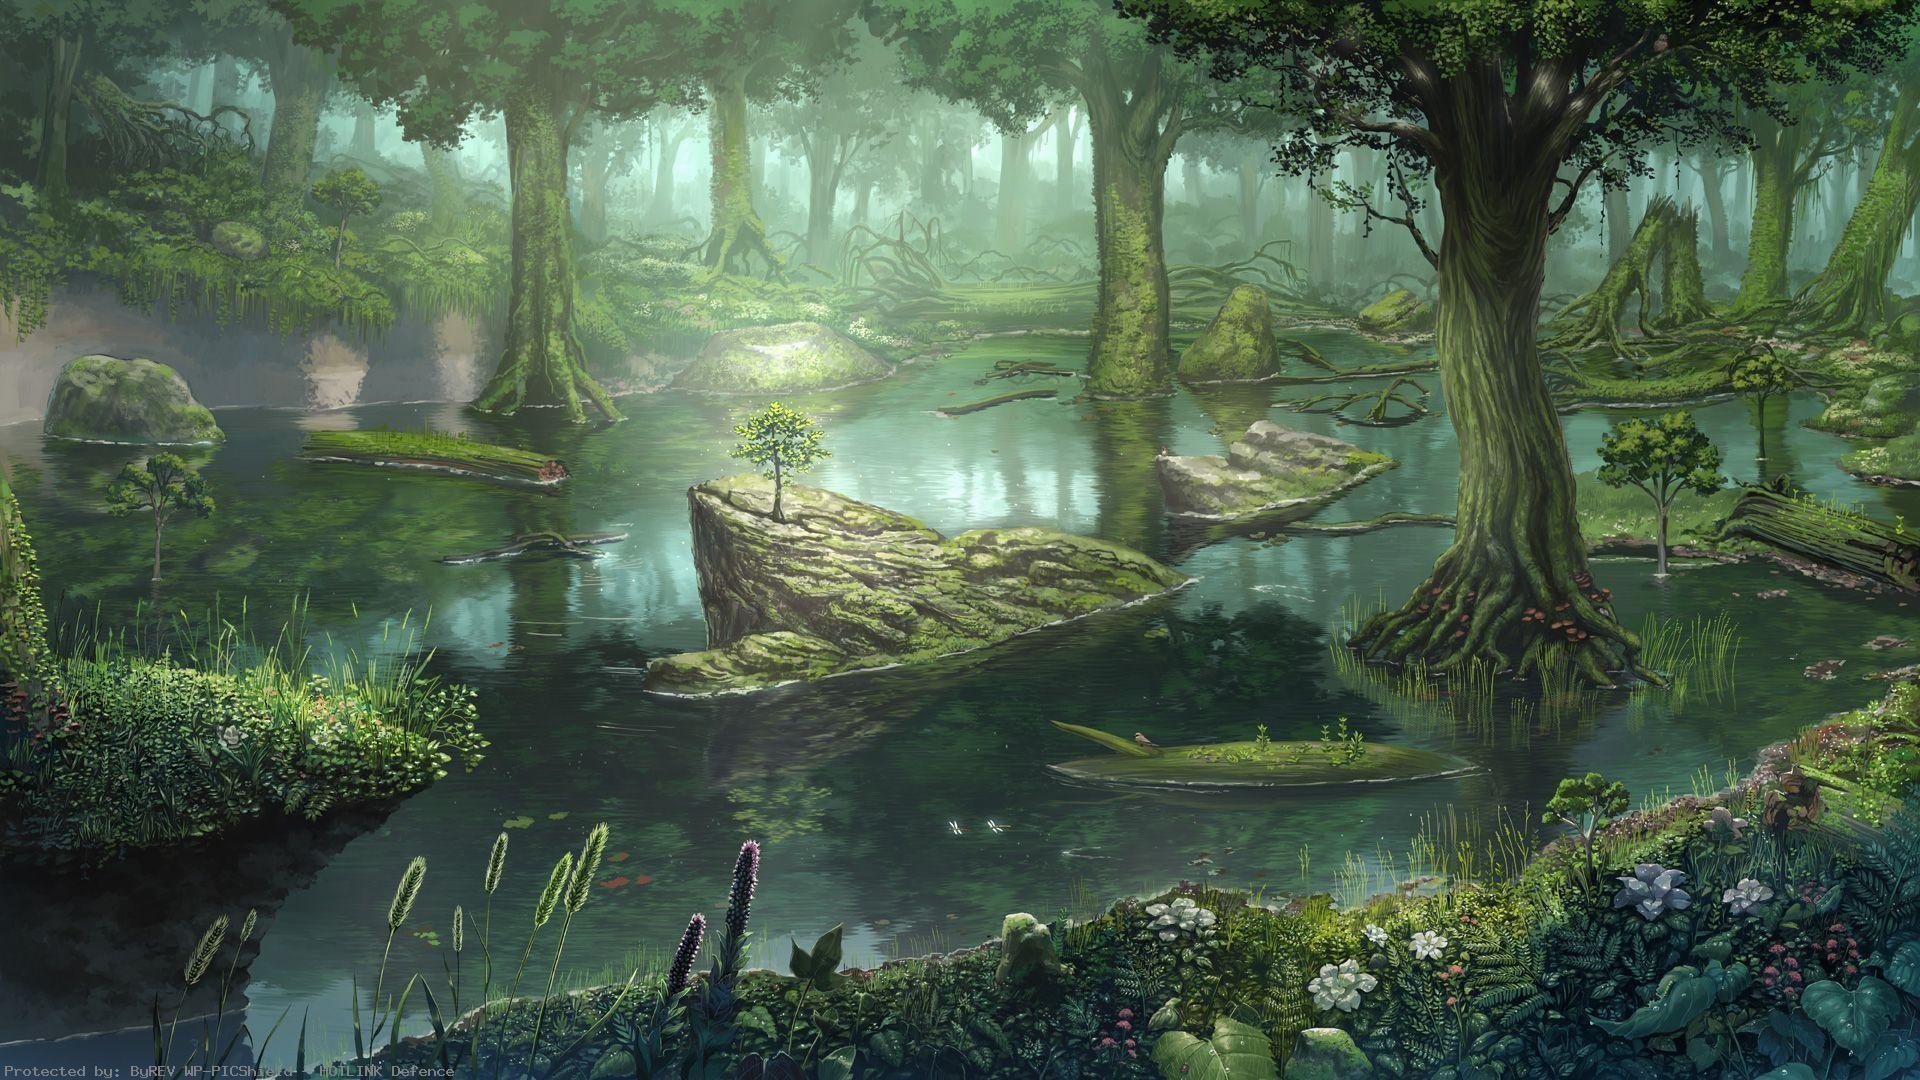 fantasy-swamp-Forest-swamp-wallpaper-wp4004163